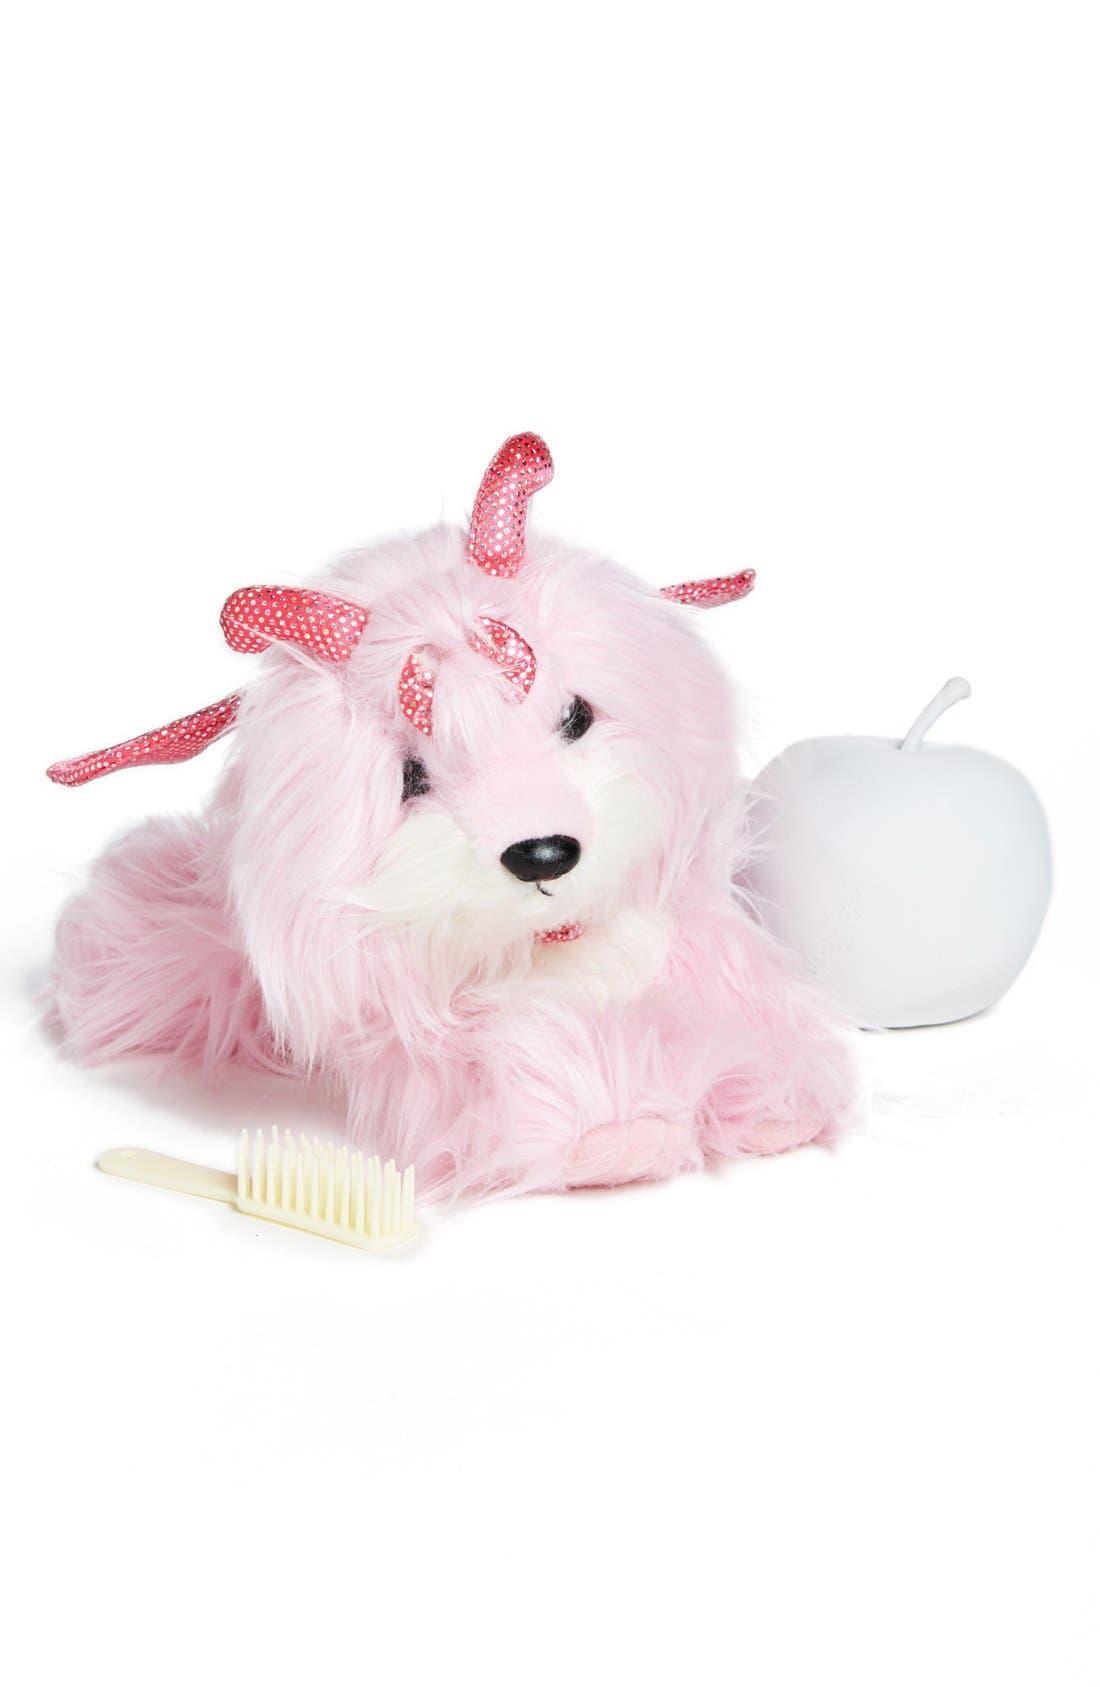 Main Image - Aurora World Toys 'Sugarbug Puppillon' 10 Inch Puppy Dog Stuffed Animal